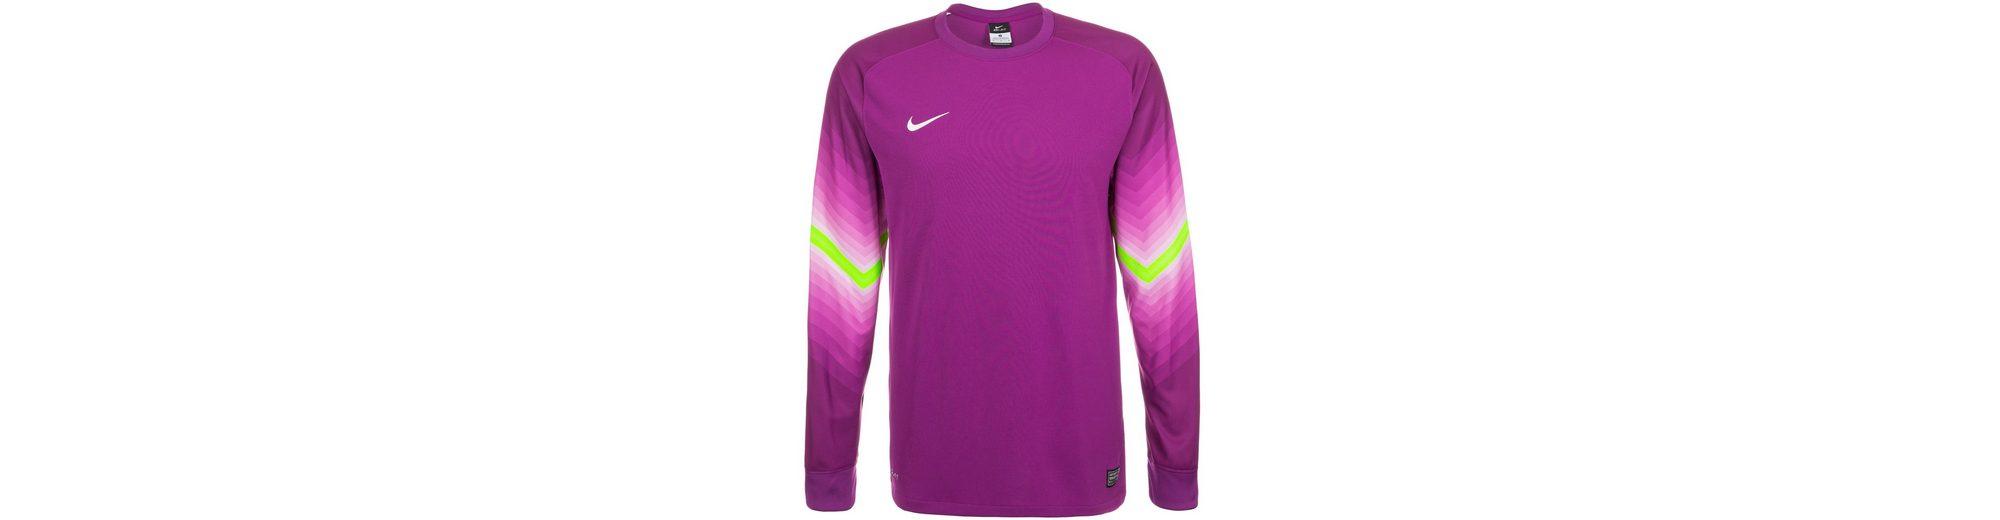 Websites Online-Verkauf Nike Goleiro Torwarttrikot Herren Billig Verkauf 100% Original mpjIEALS